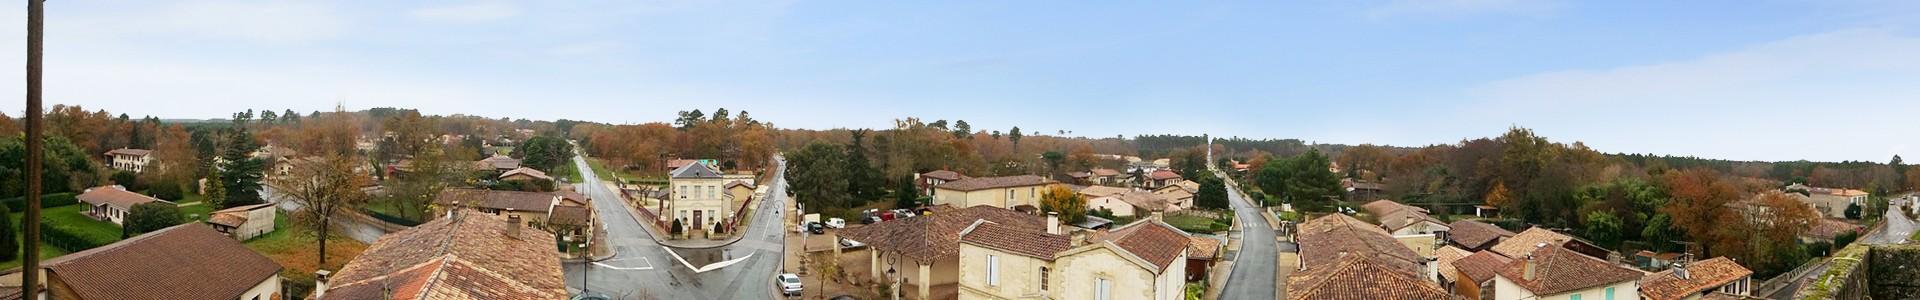 http://www.saintmichel-de-rieufret.fr/wp-content/uploads/2015/03/panoramique-saint-michel-de-rieufret-1920x3001-1920x300.jpg